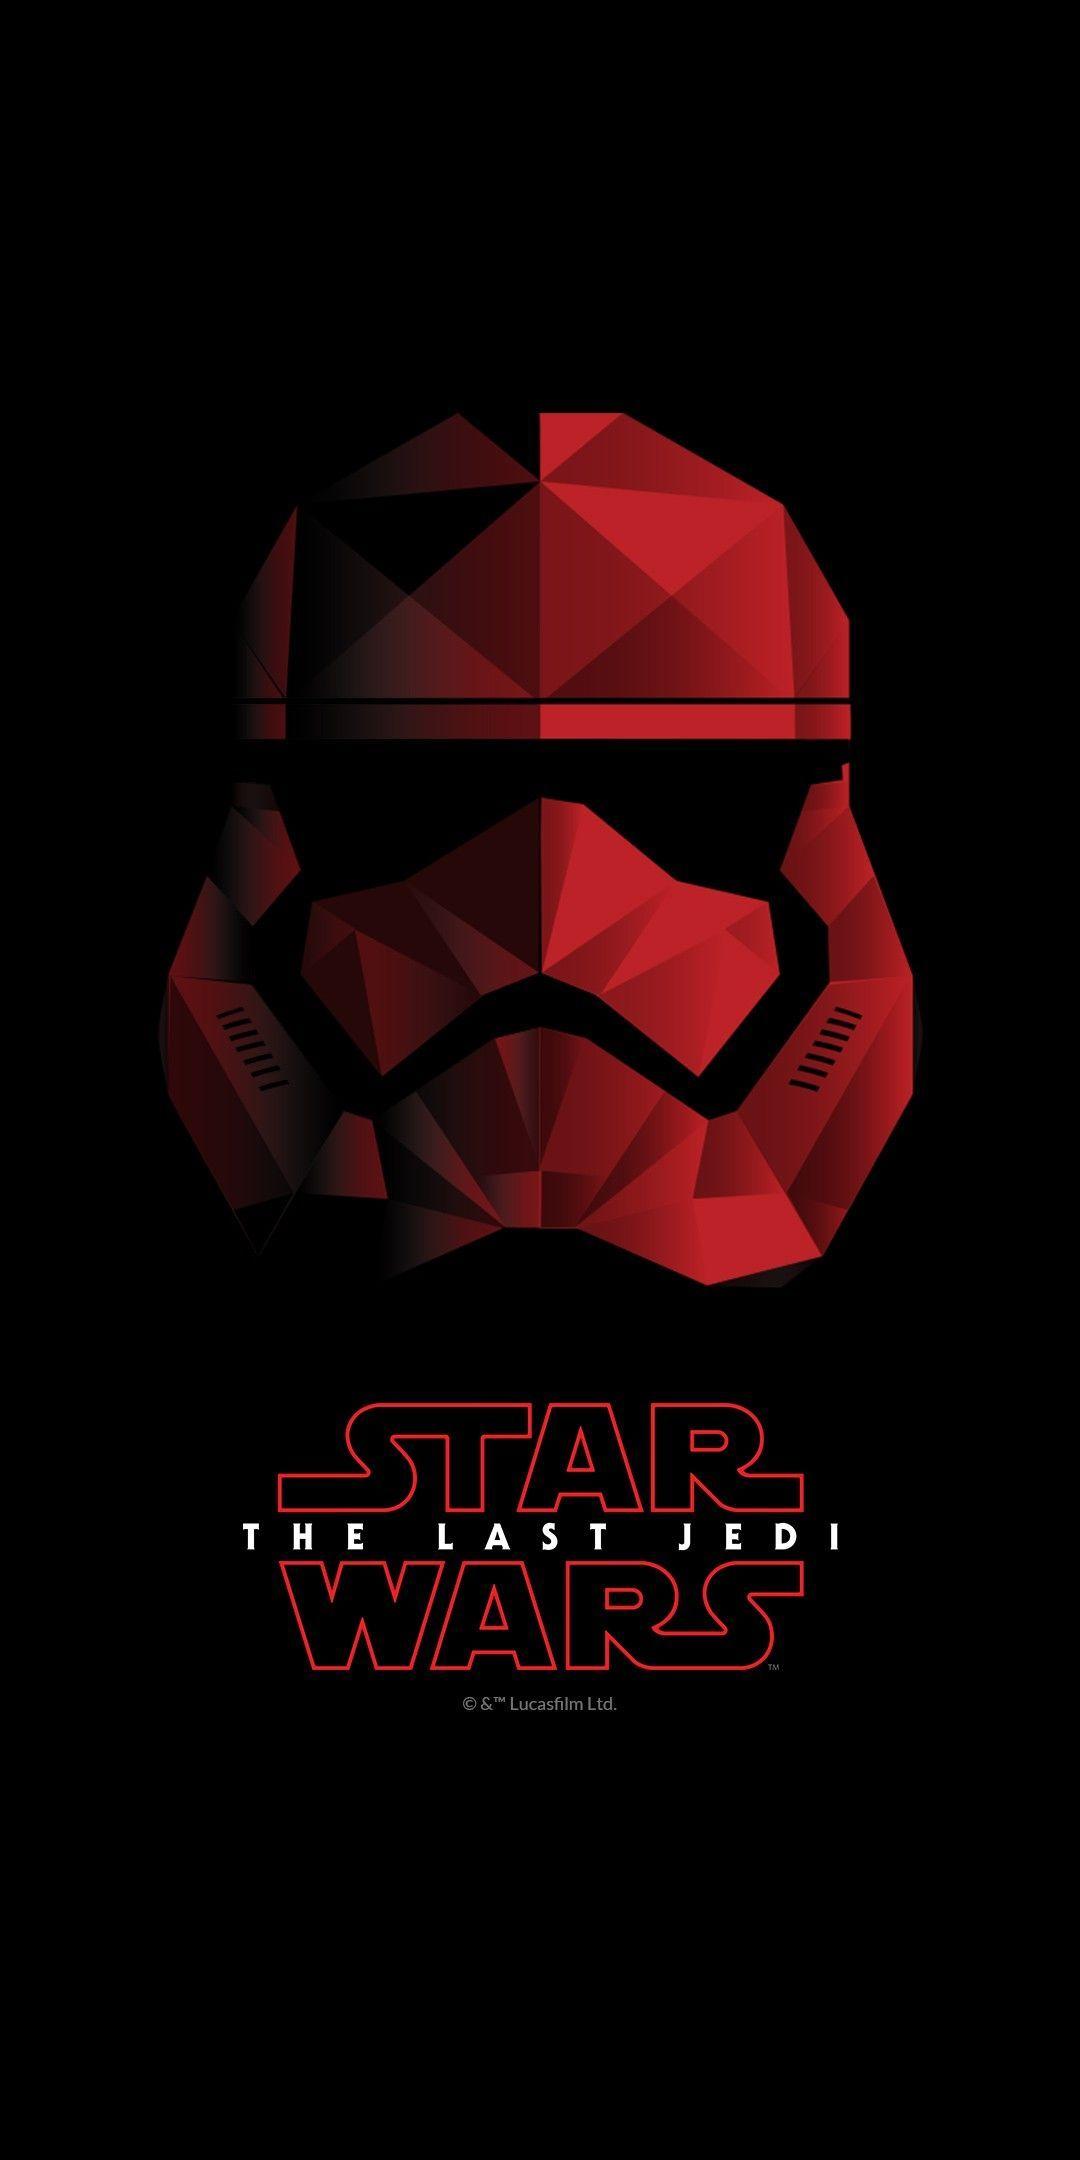 Dark Iphone Wallpaper Star Wars Wallpaper Iphone Star Wars Wallpaper Star Wars Models Ideas for star wars logo wallpaper hd